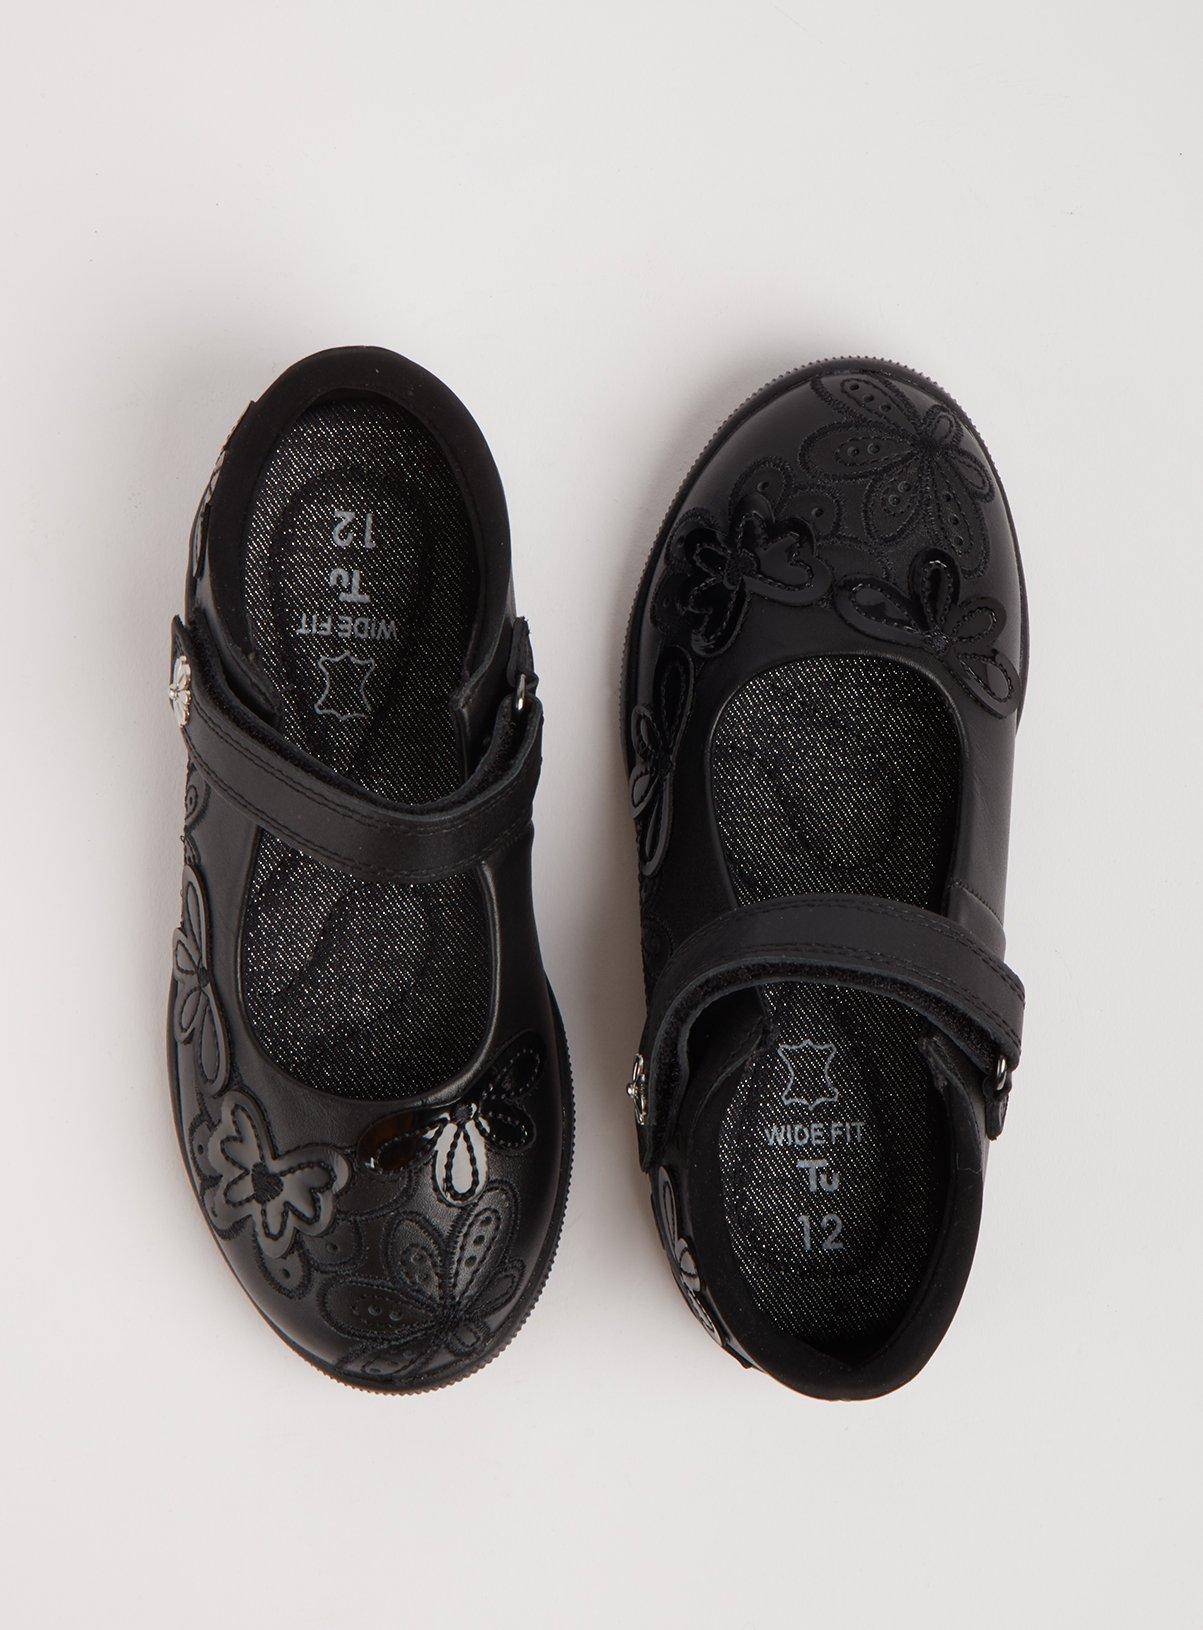 Black Leather Floral Strap Wide Fit School Shoes - 13 Infant